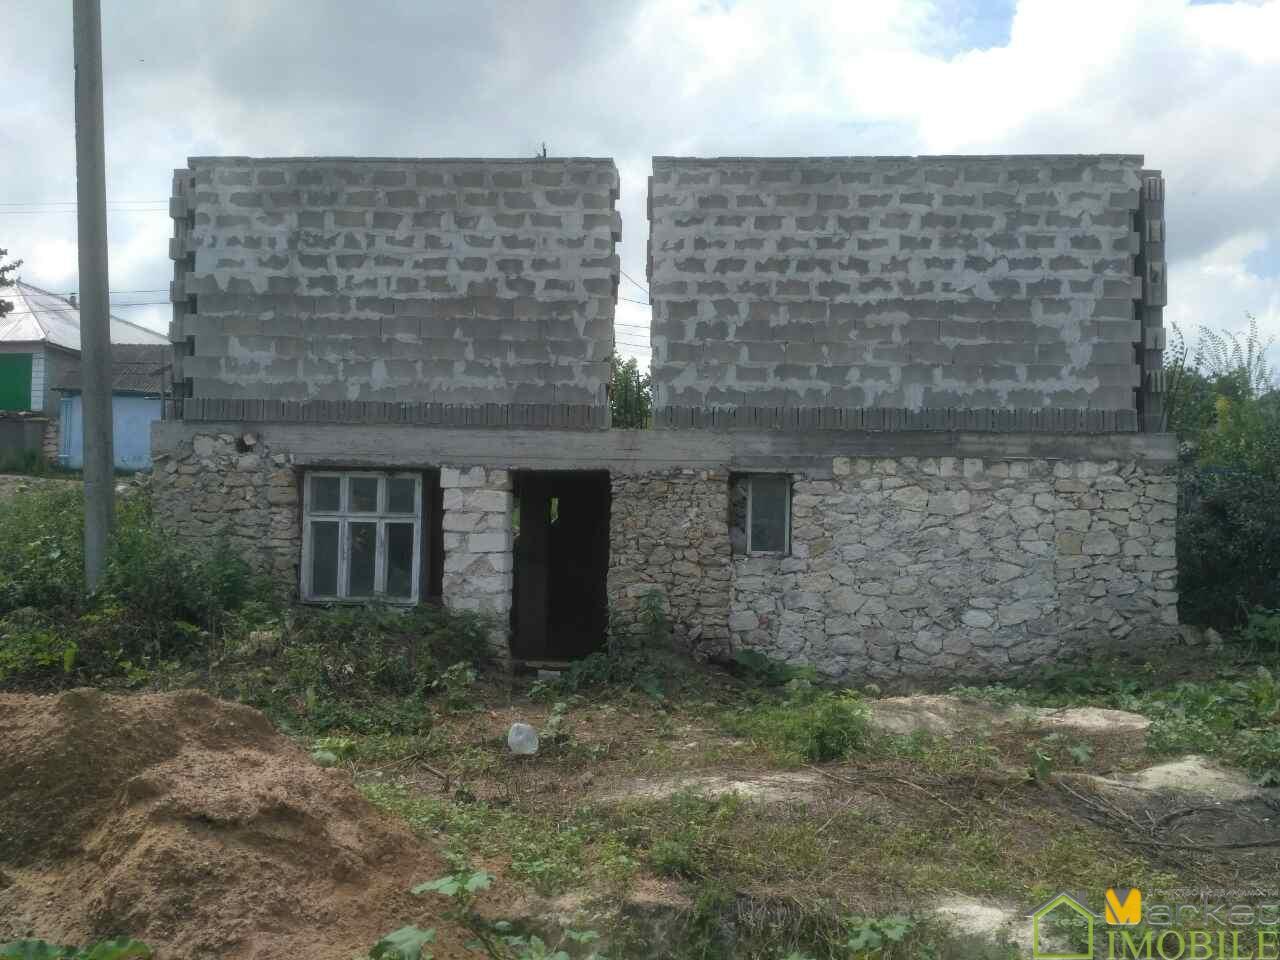 Vindem teren pentru constructie in localitatea Bic